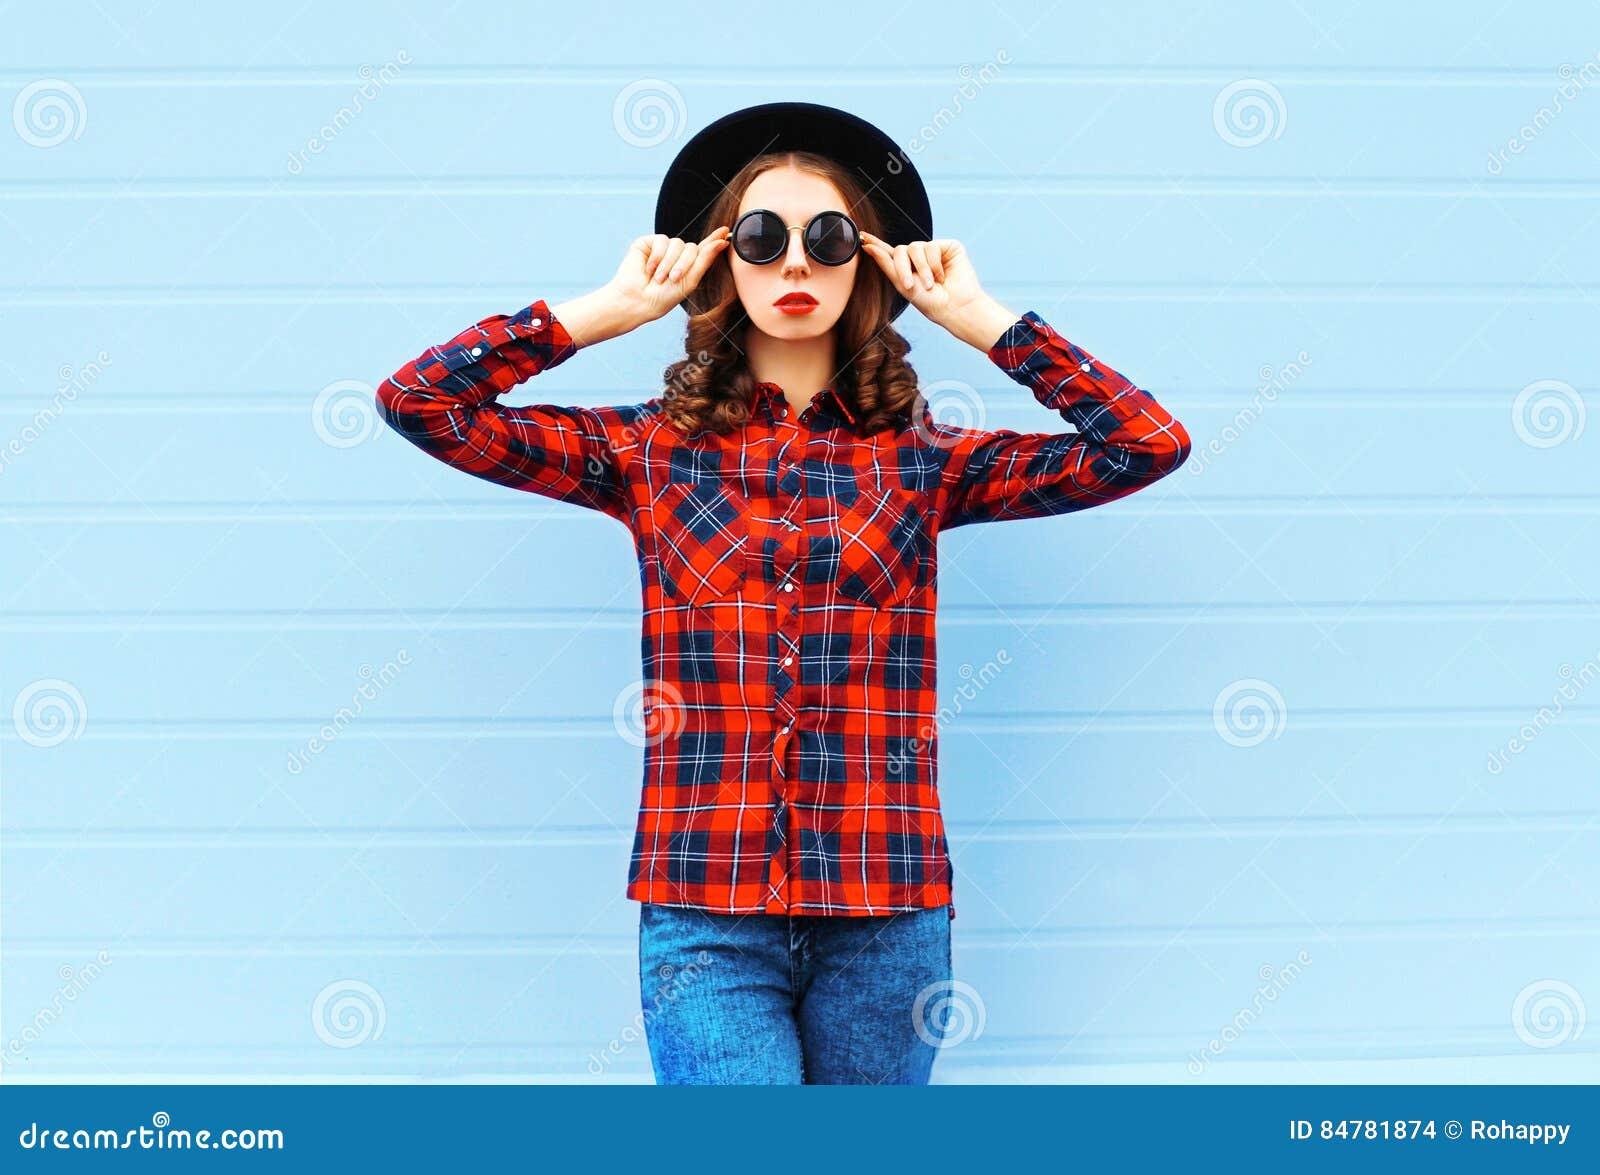 Forme A Mujer Joven El Sombrero Negro Que Lleva Modelo 93f6aa3dd1e